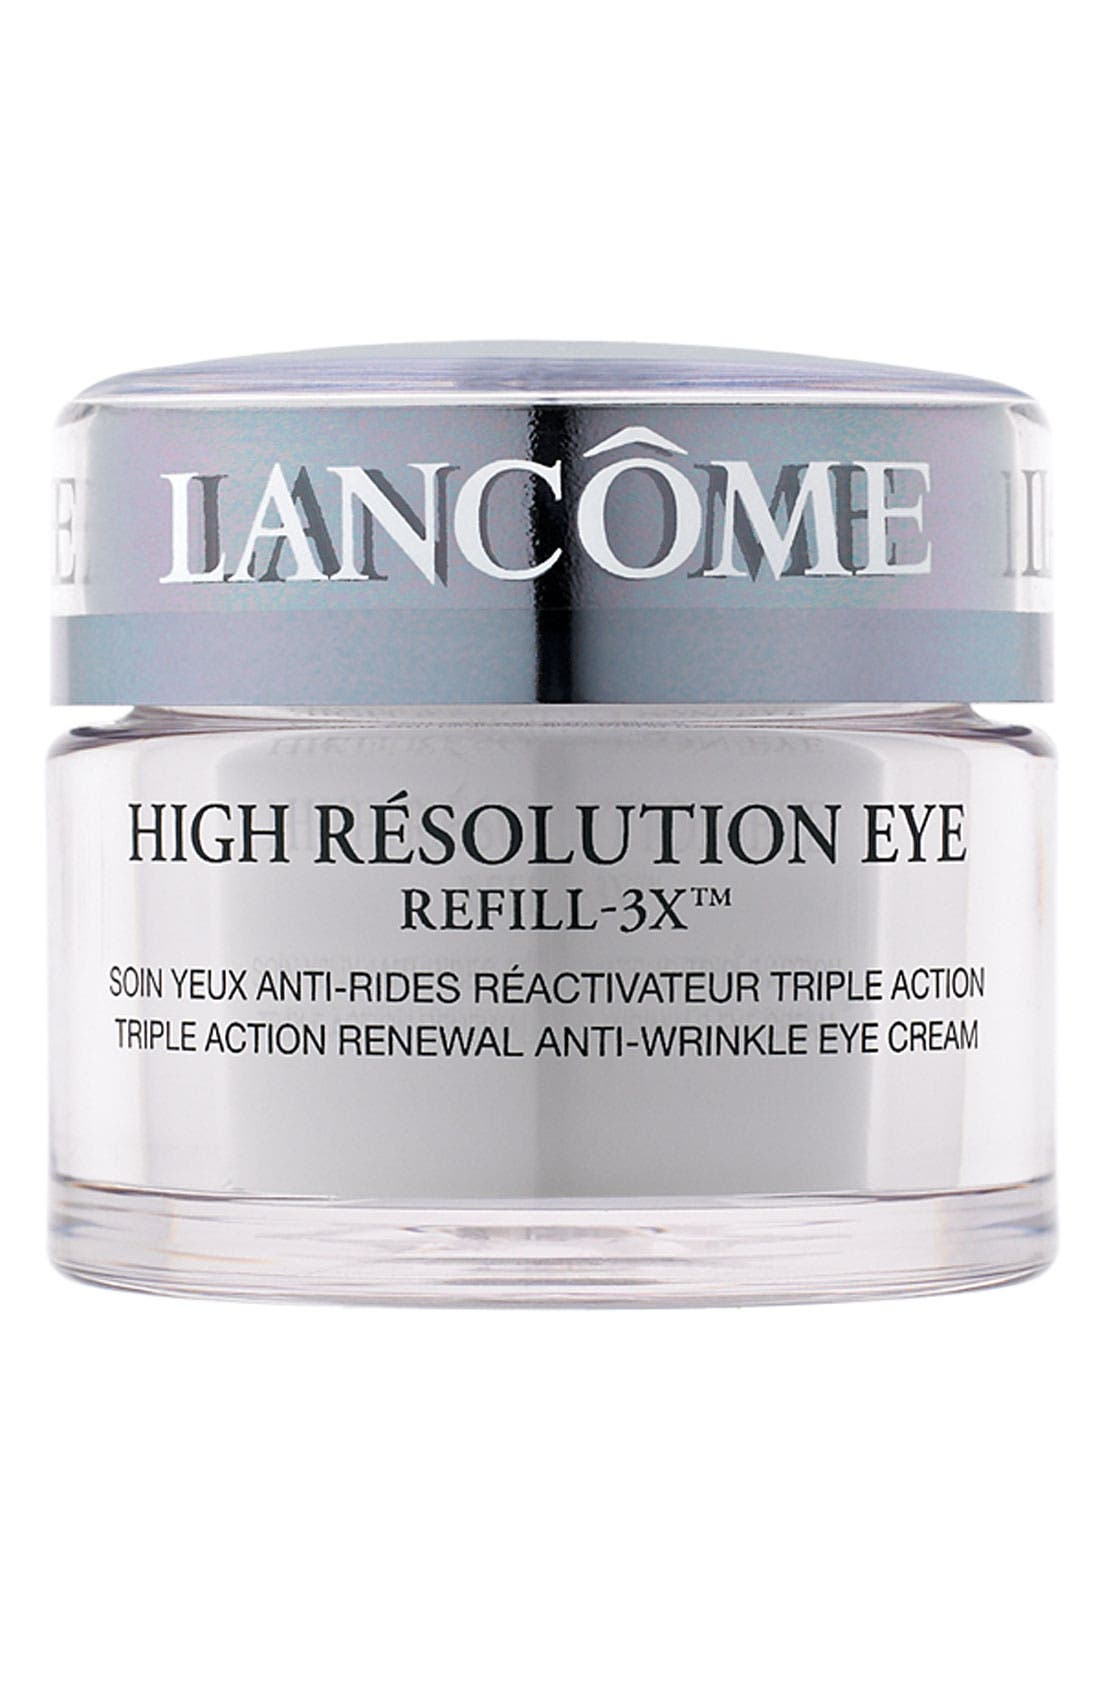 High Résolution Refill-3X Anti-Wrinkle Eye Cream,                         Main,                         color, NO COLOR